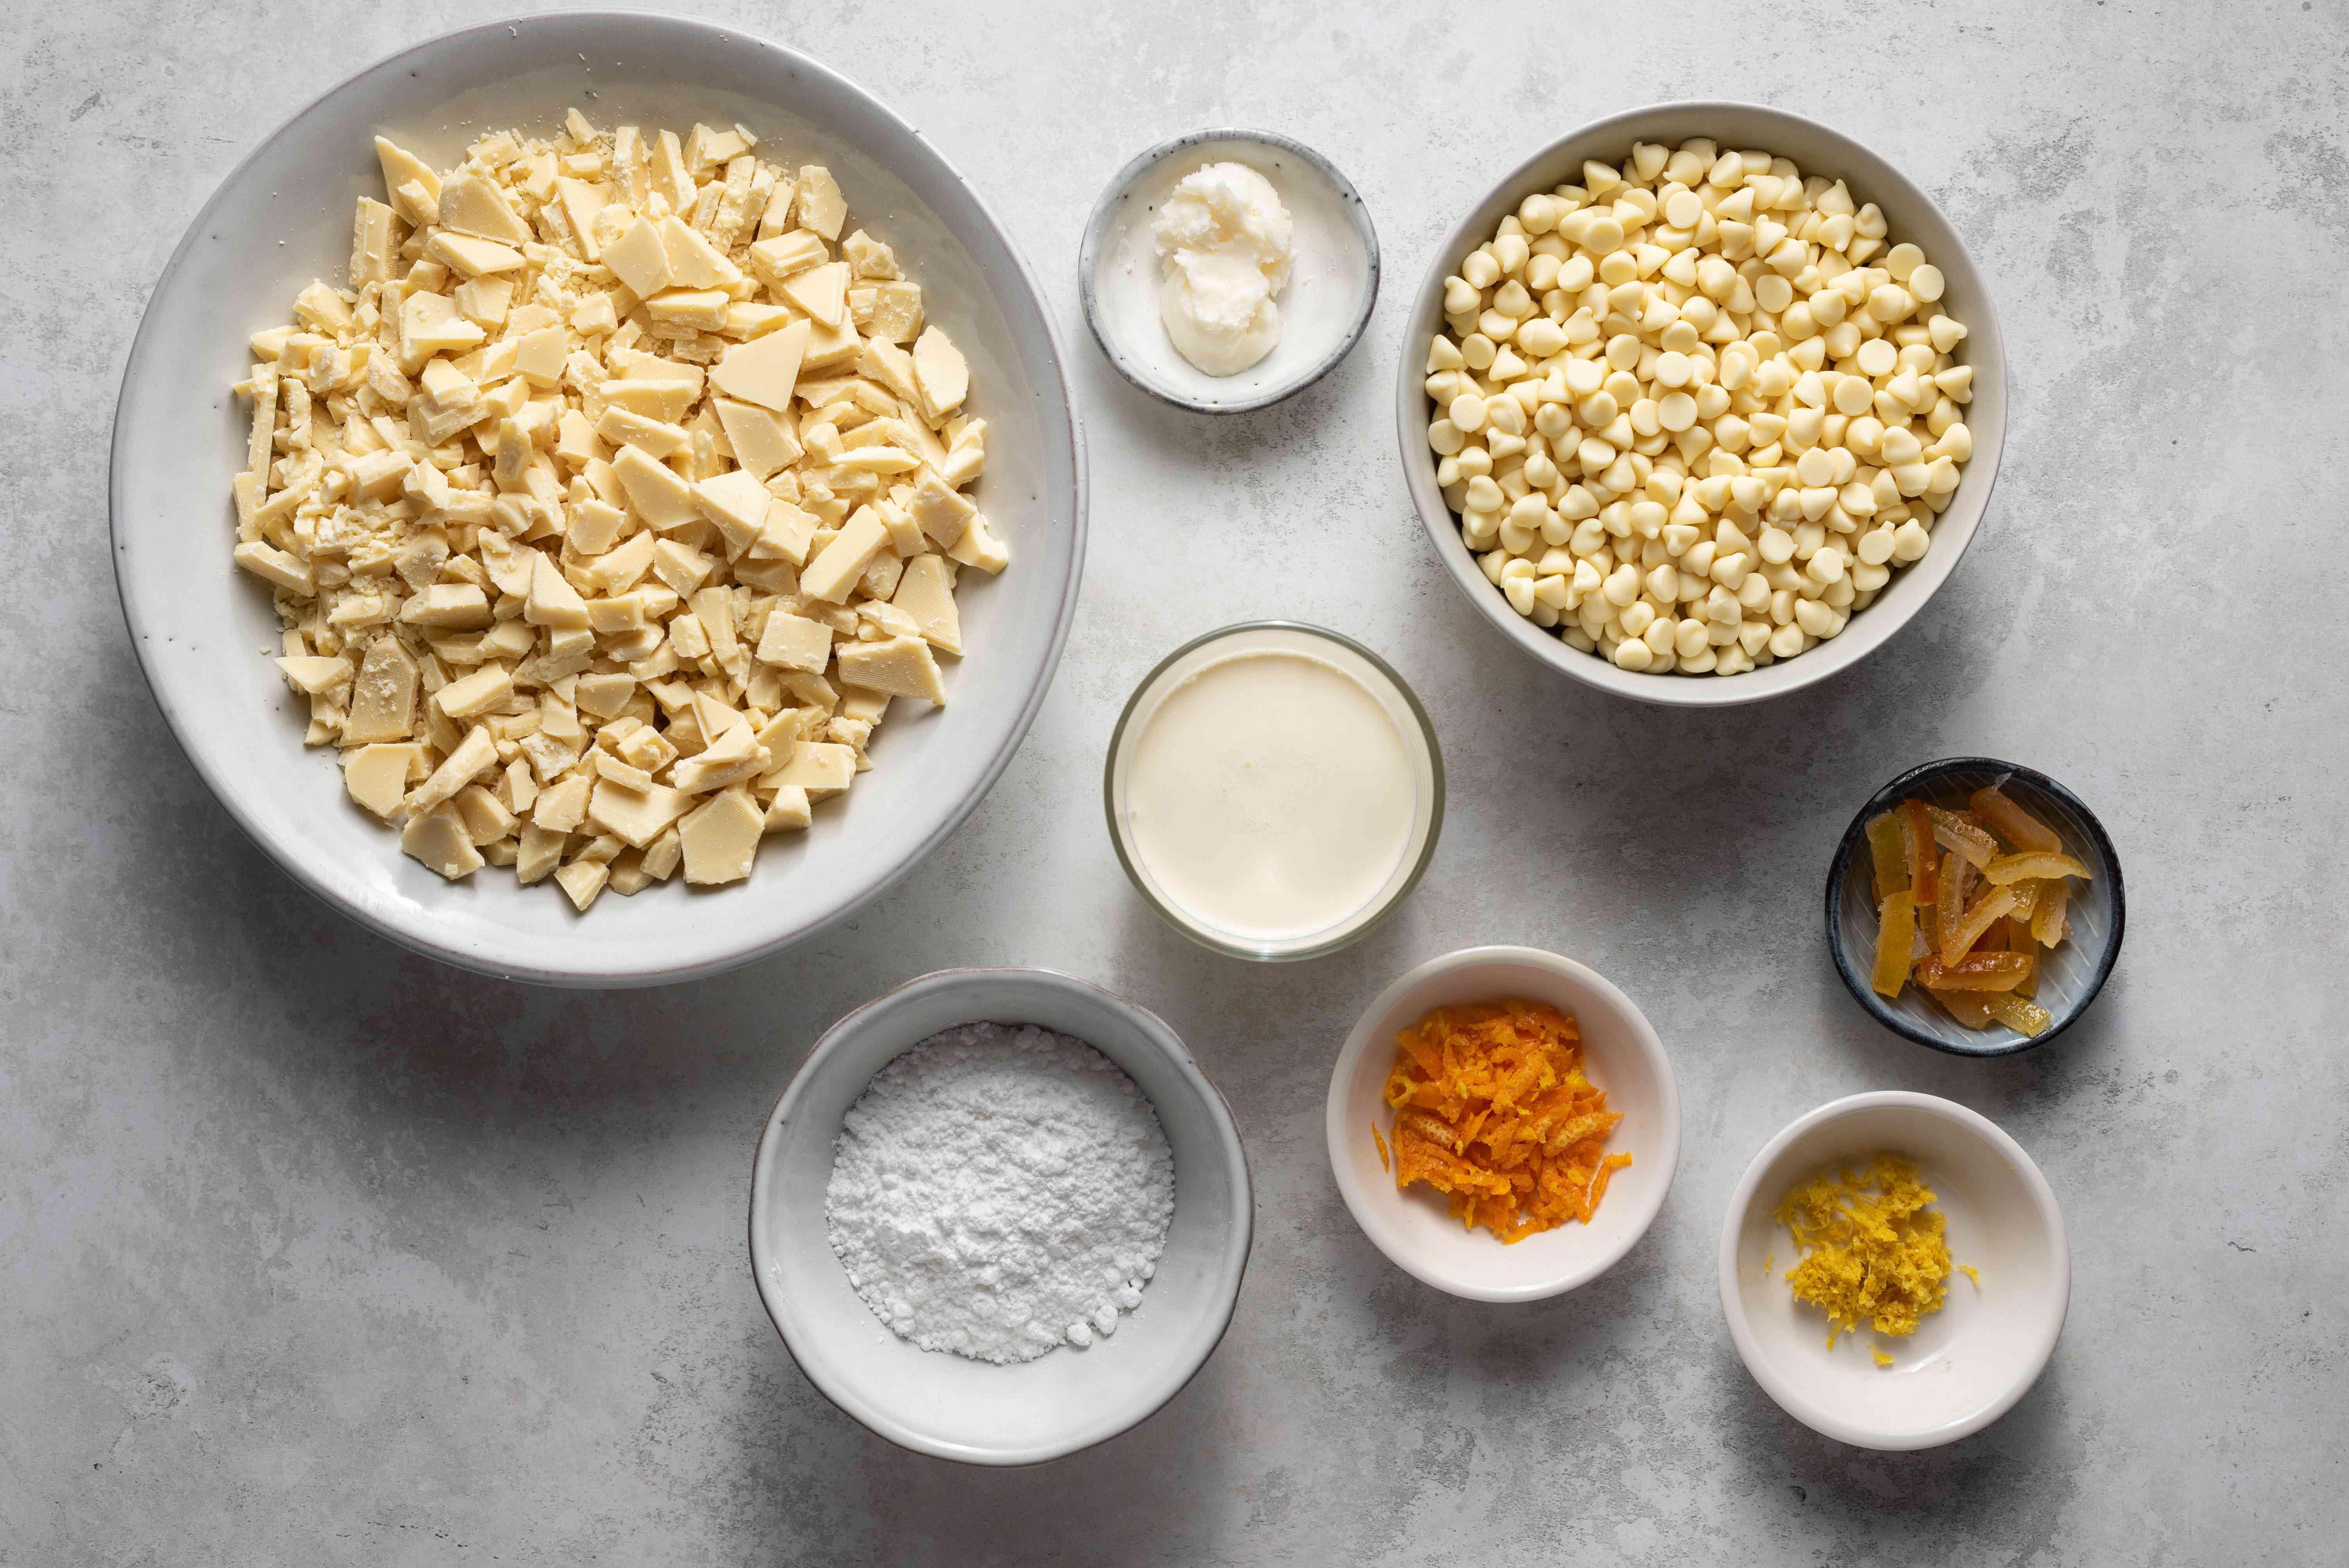 White Chocolate Citrus Truffles ingredients